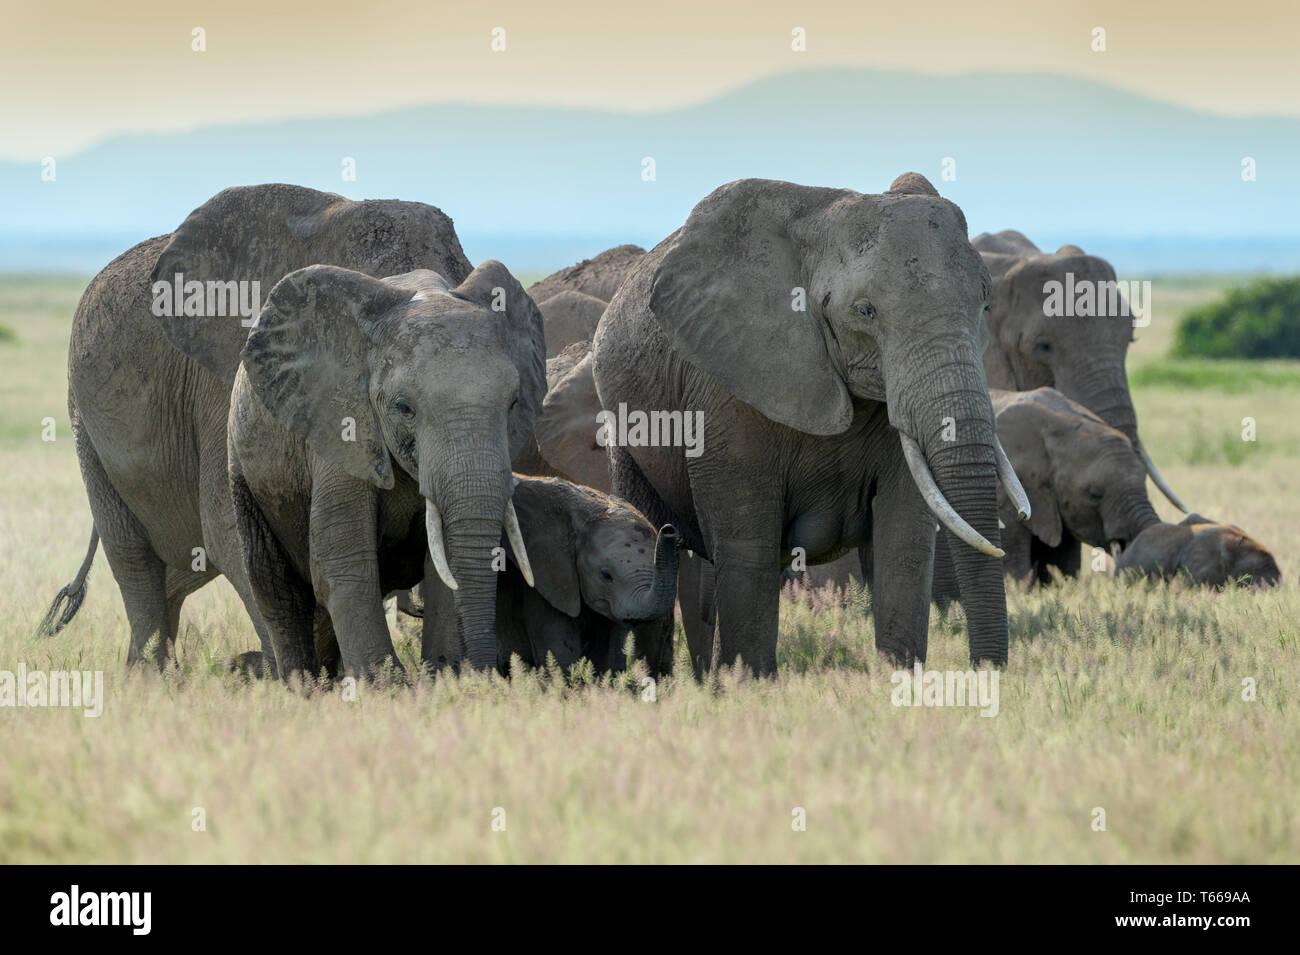 African elephant (Loxodonta africana) herd walking together protecting baby on savanna, Amboseli national park, Kenya. - Stock Image